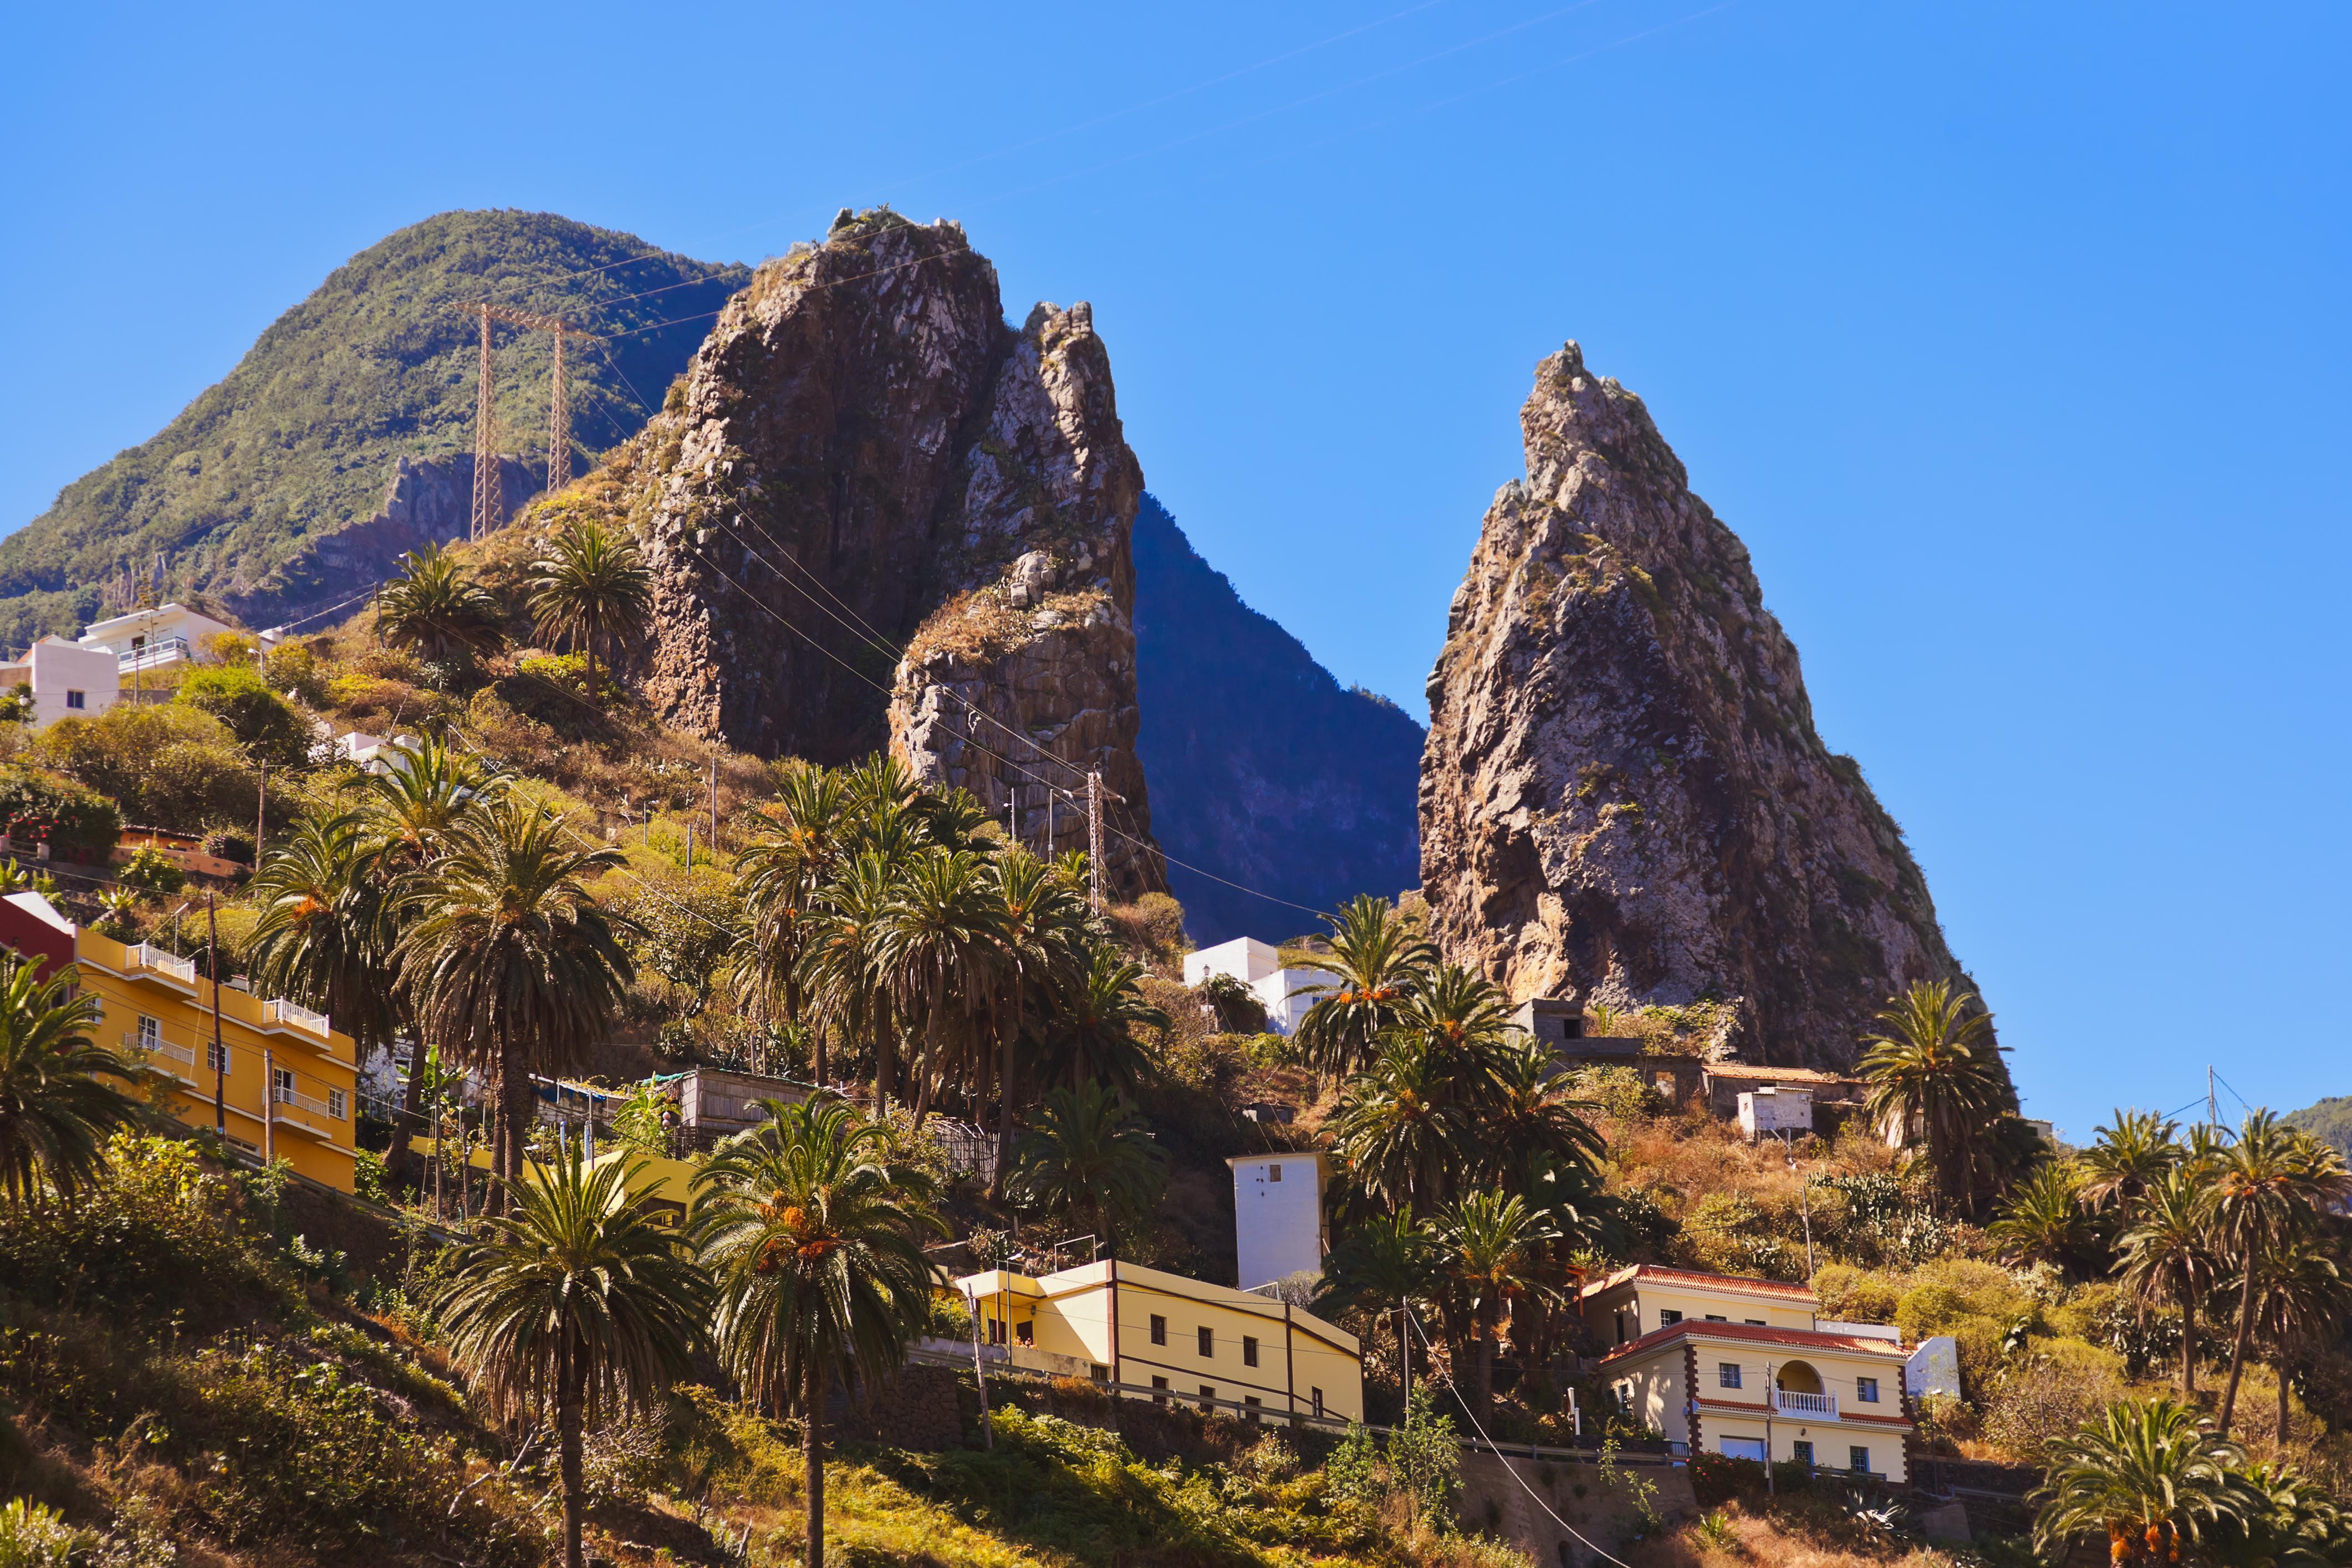 How to Spend 1 Day in La Gomera